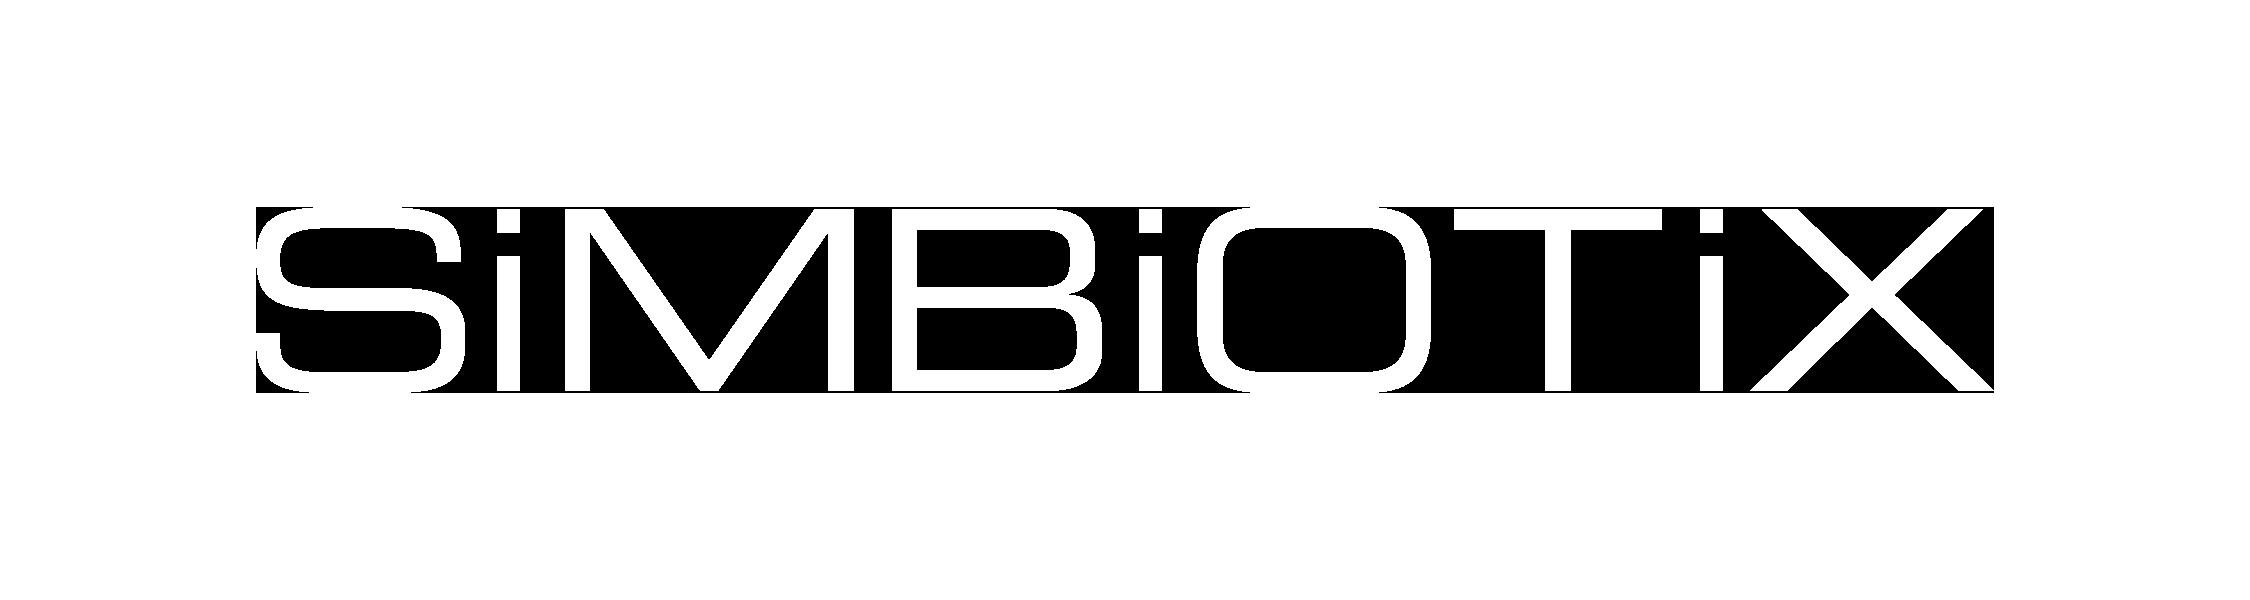 Simbiotix Control Inc.